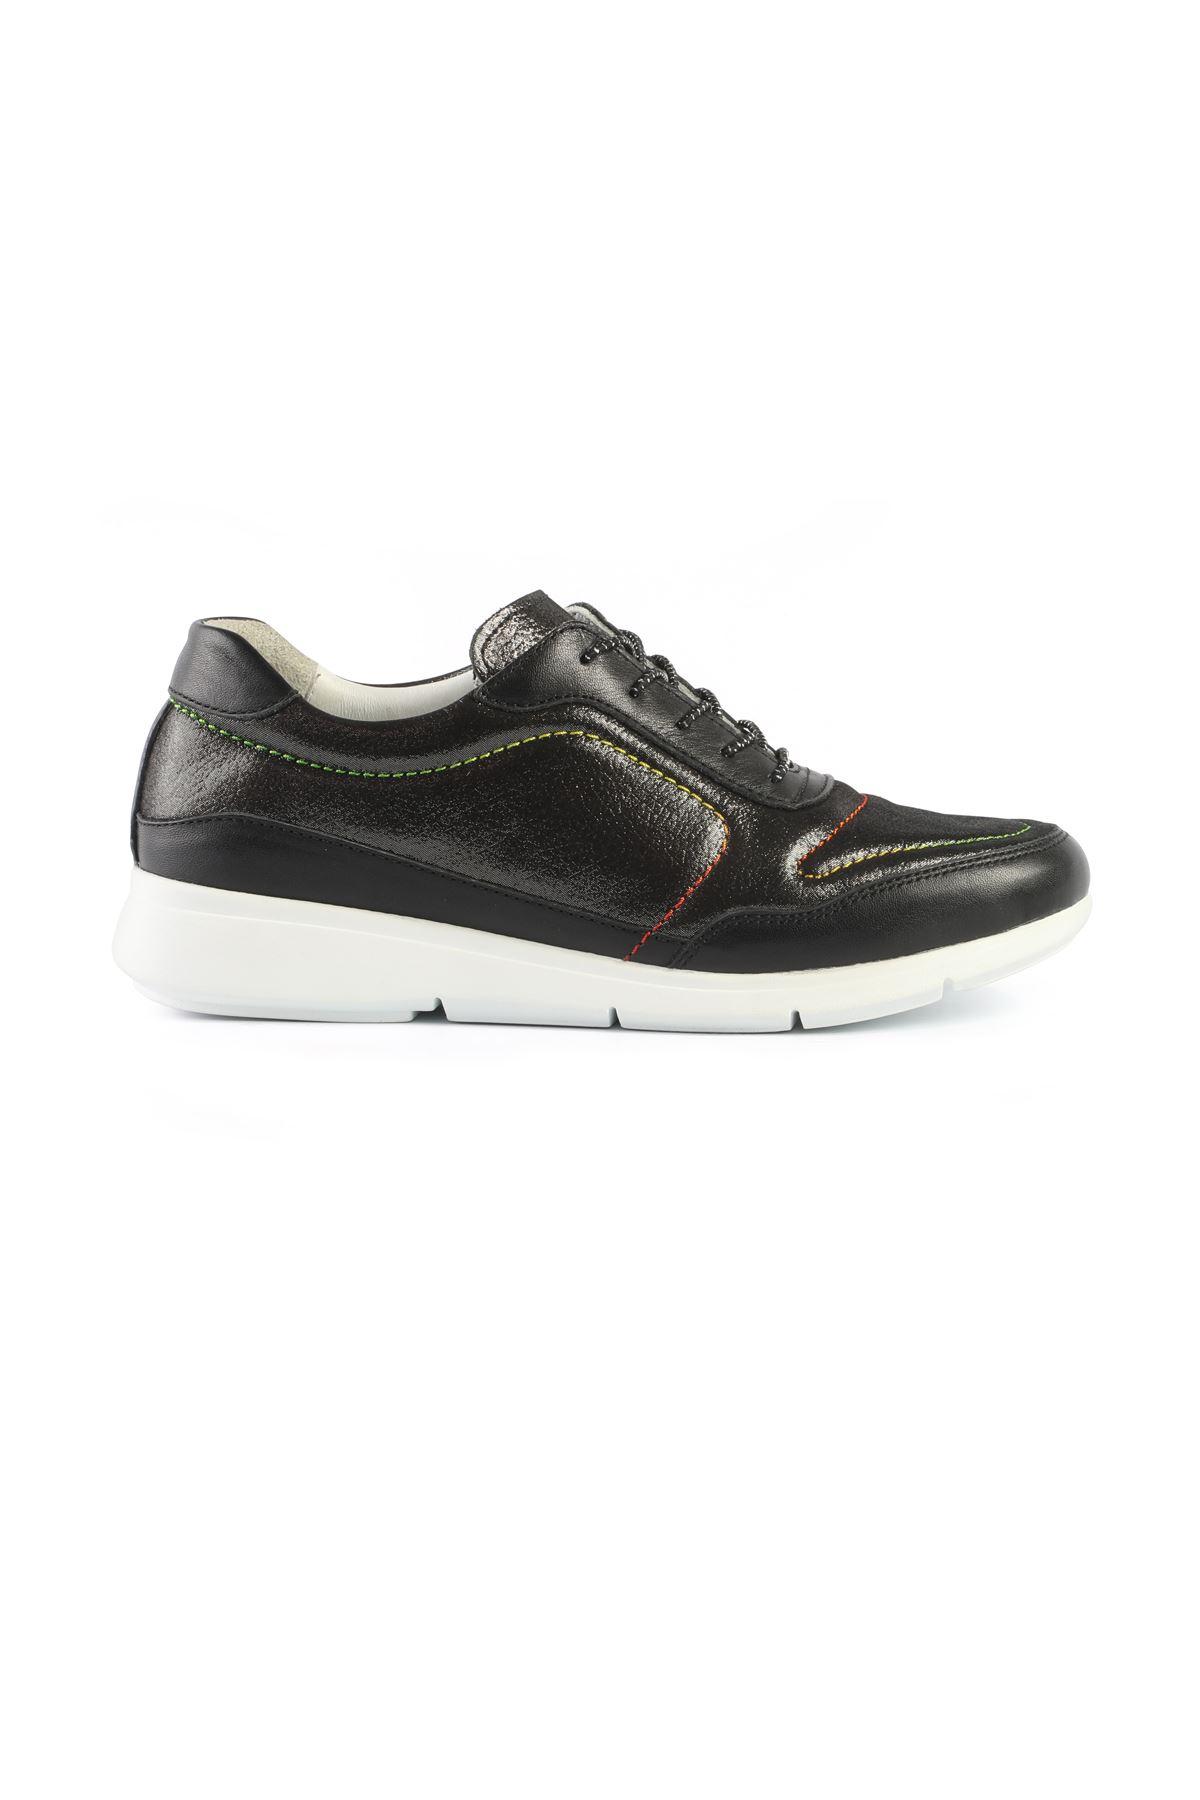 Libero AE0082 Black Sports Shoes